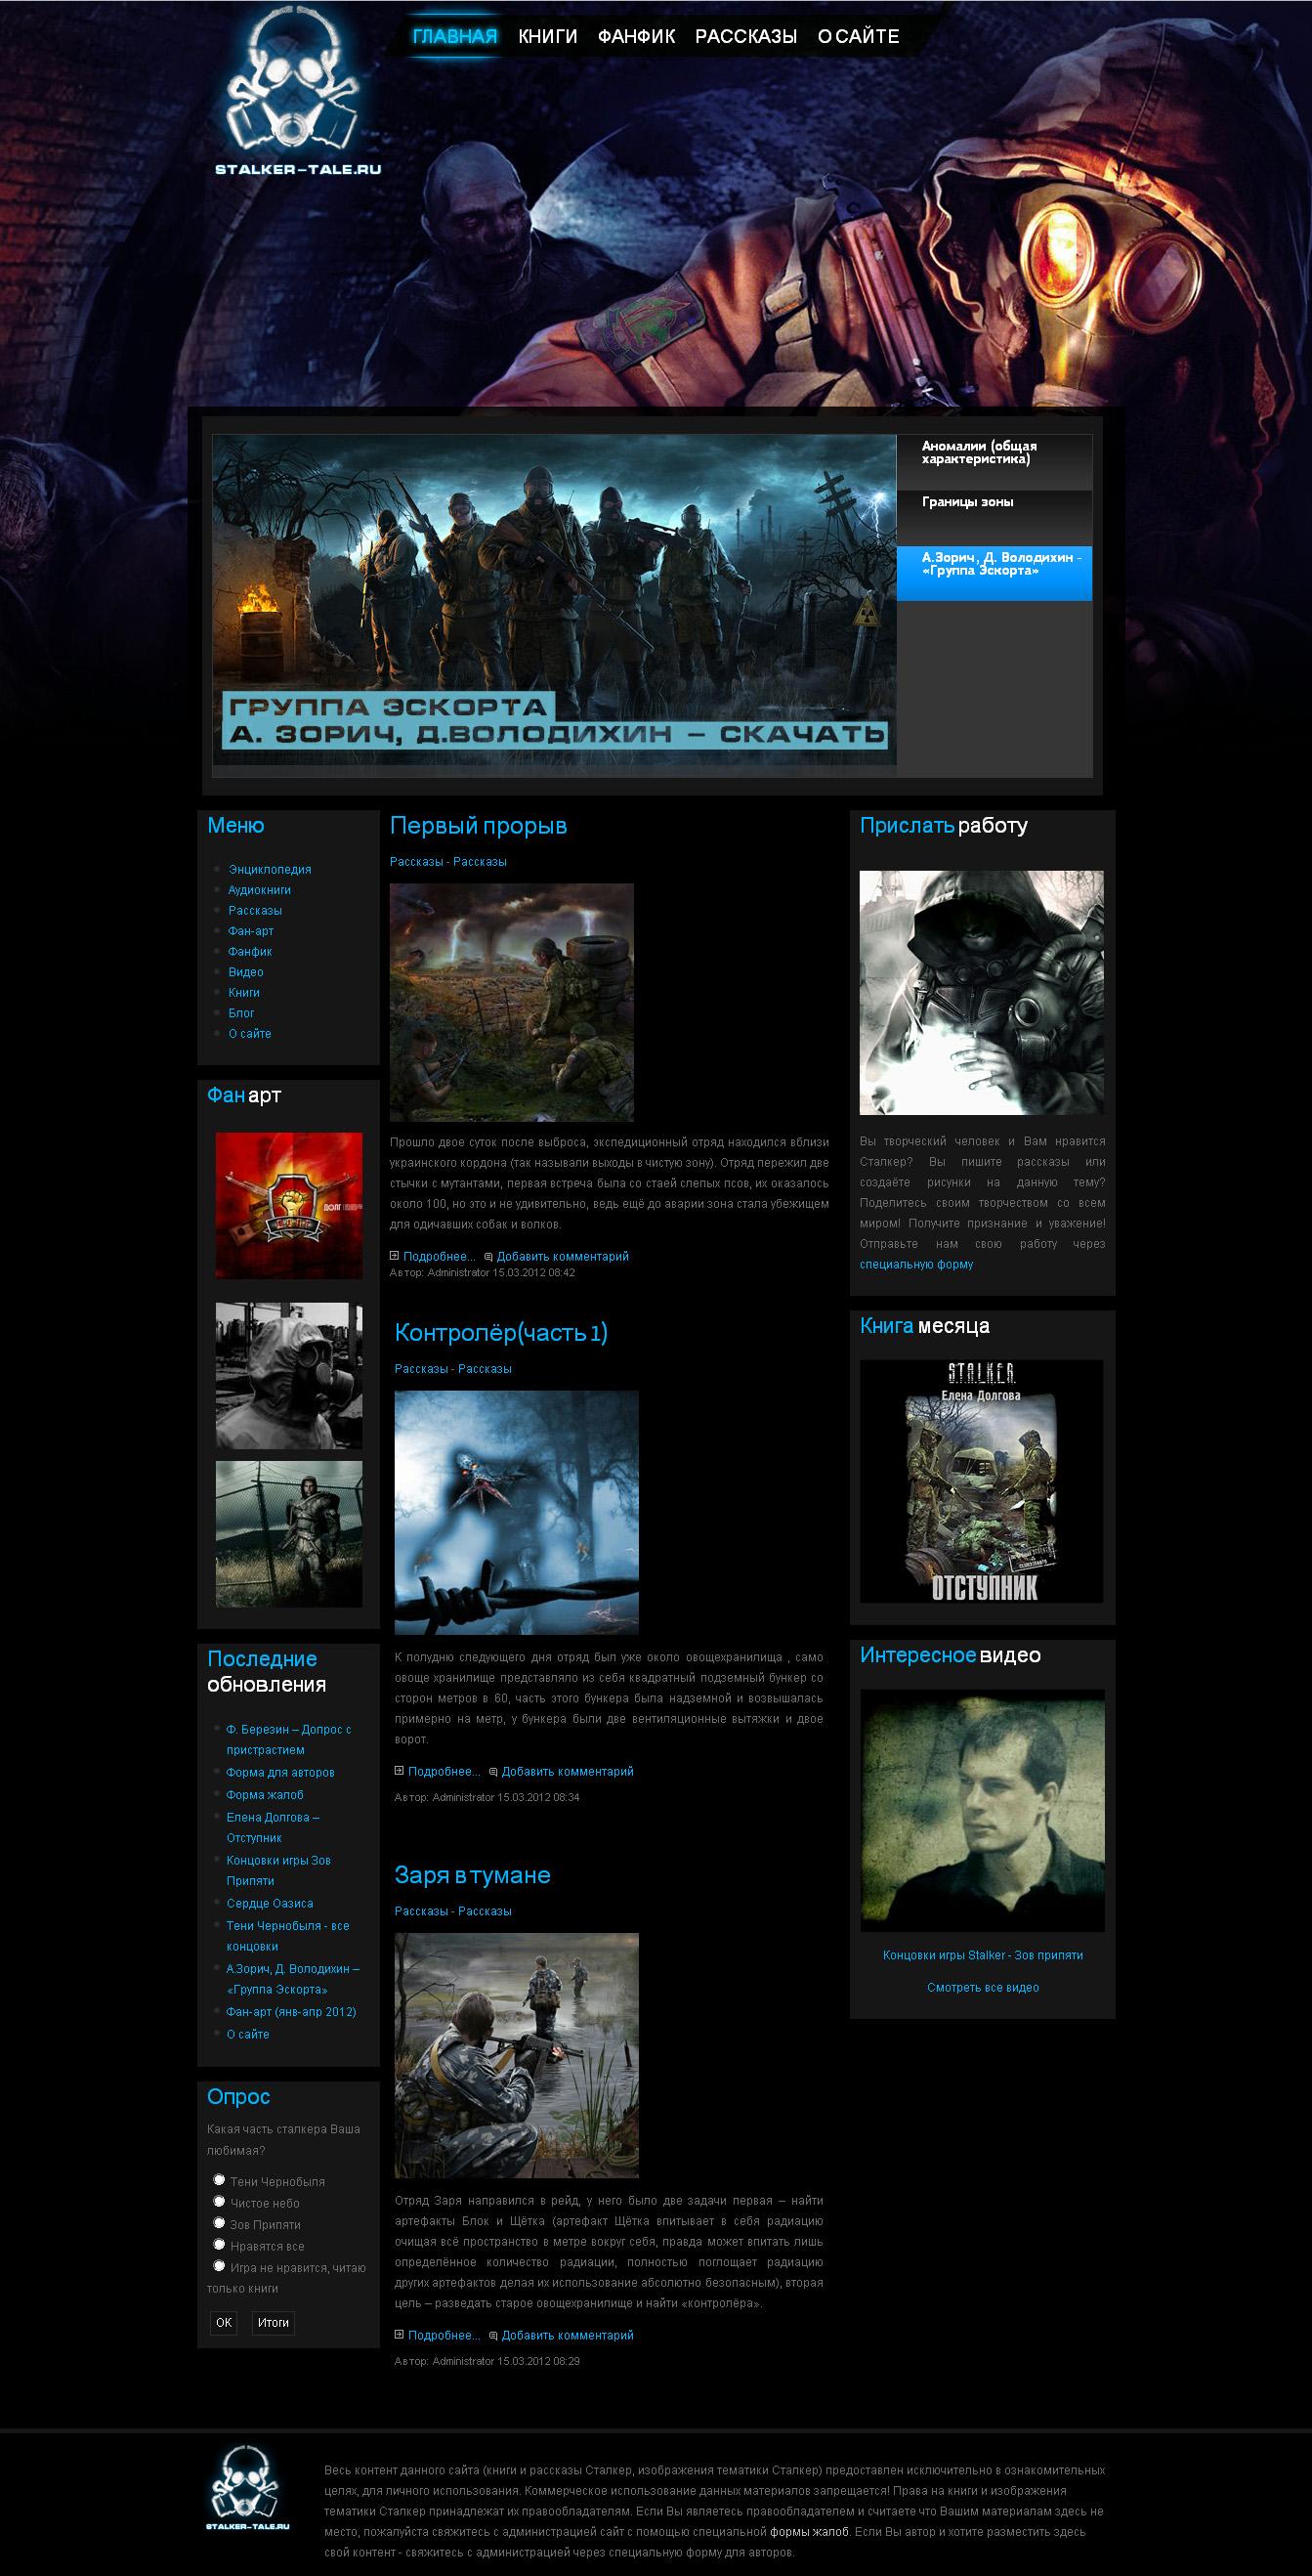 Фан сайт игры S.T.A.L.K.E.R.